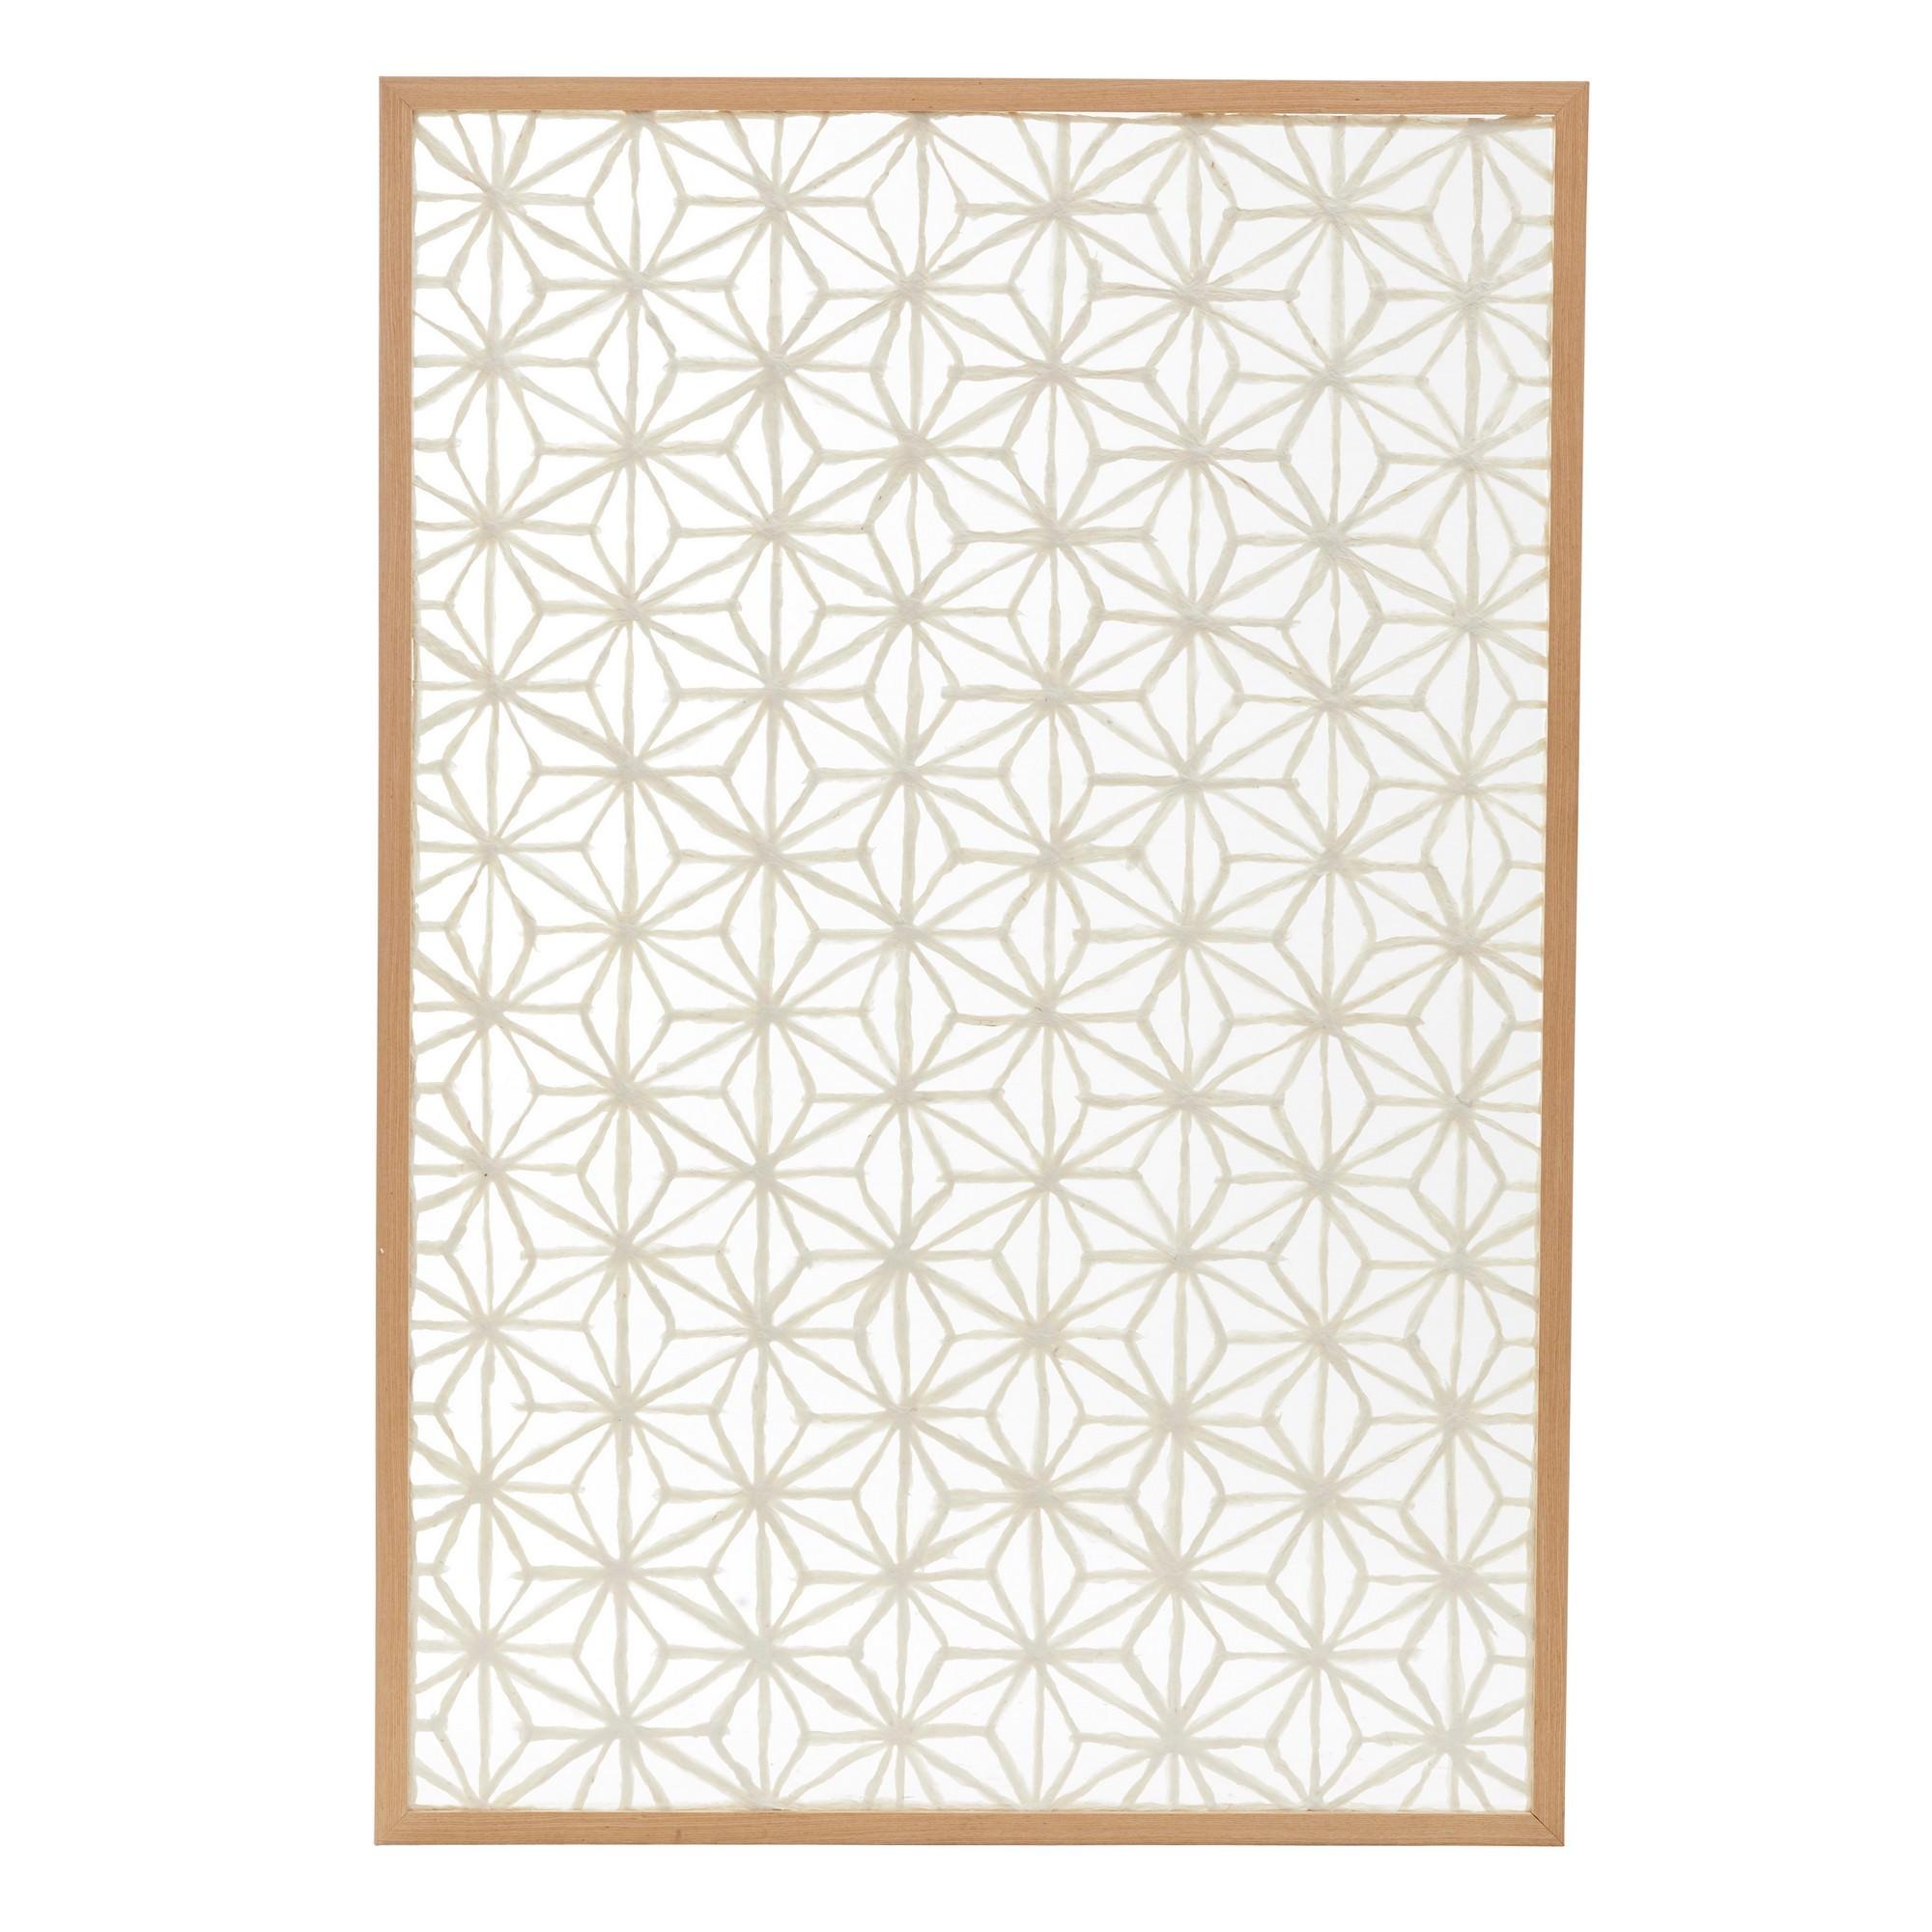 Ashland Framed Paper Art Wall Decor, 124cm